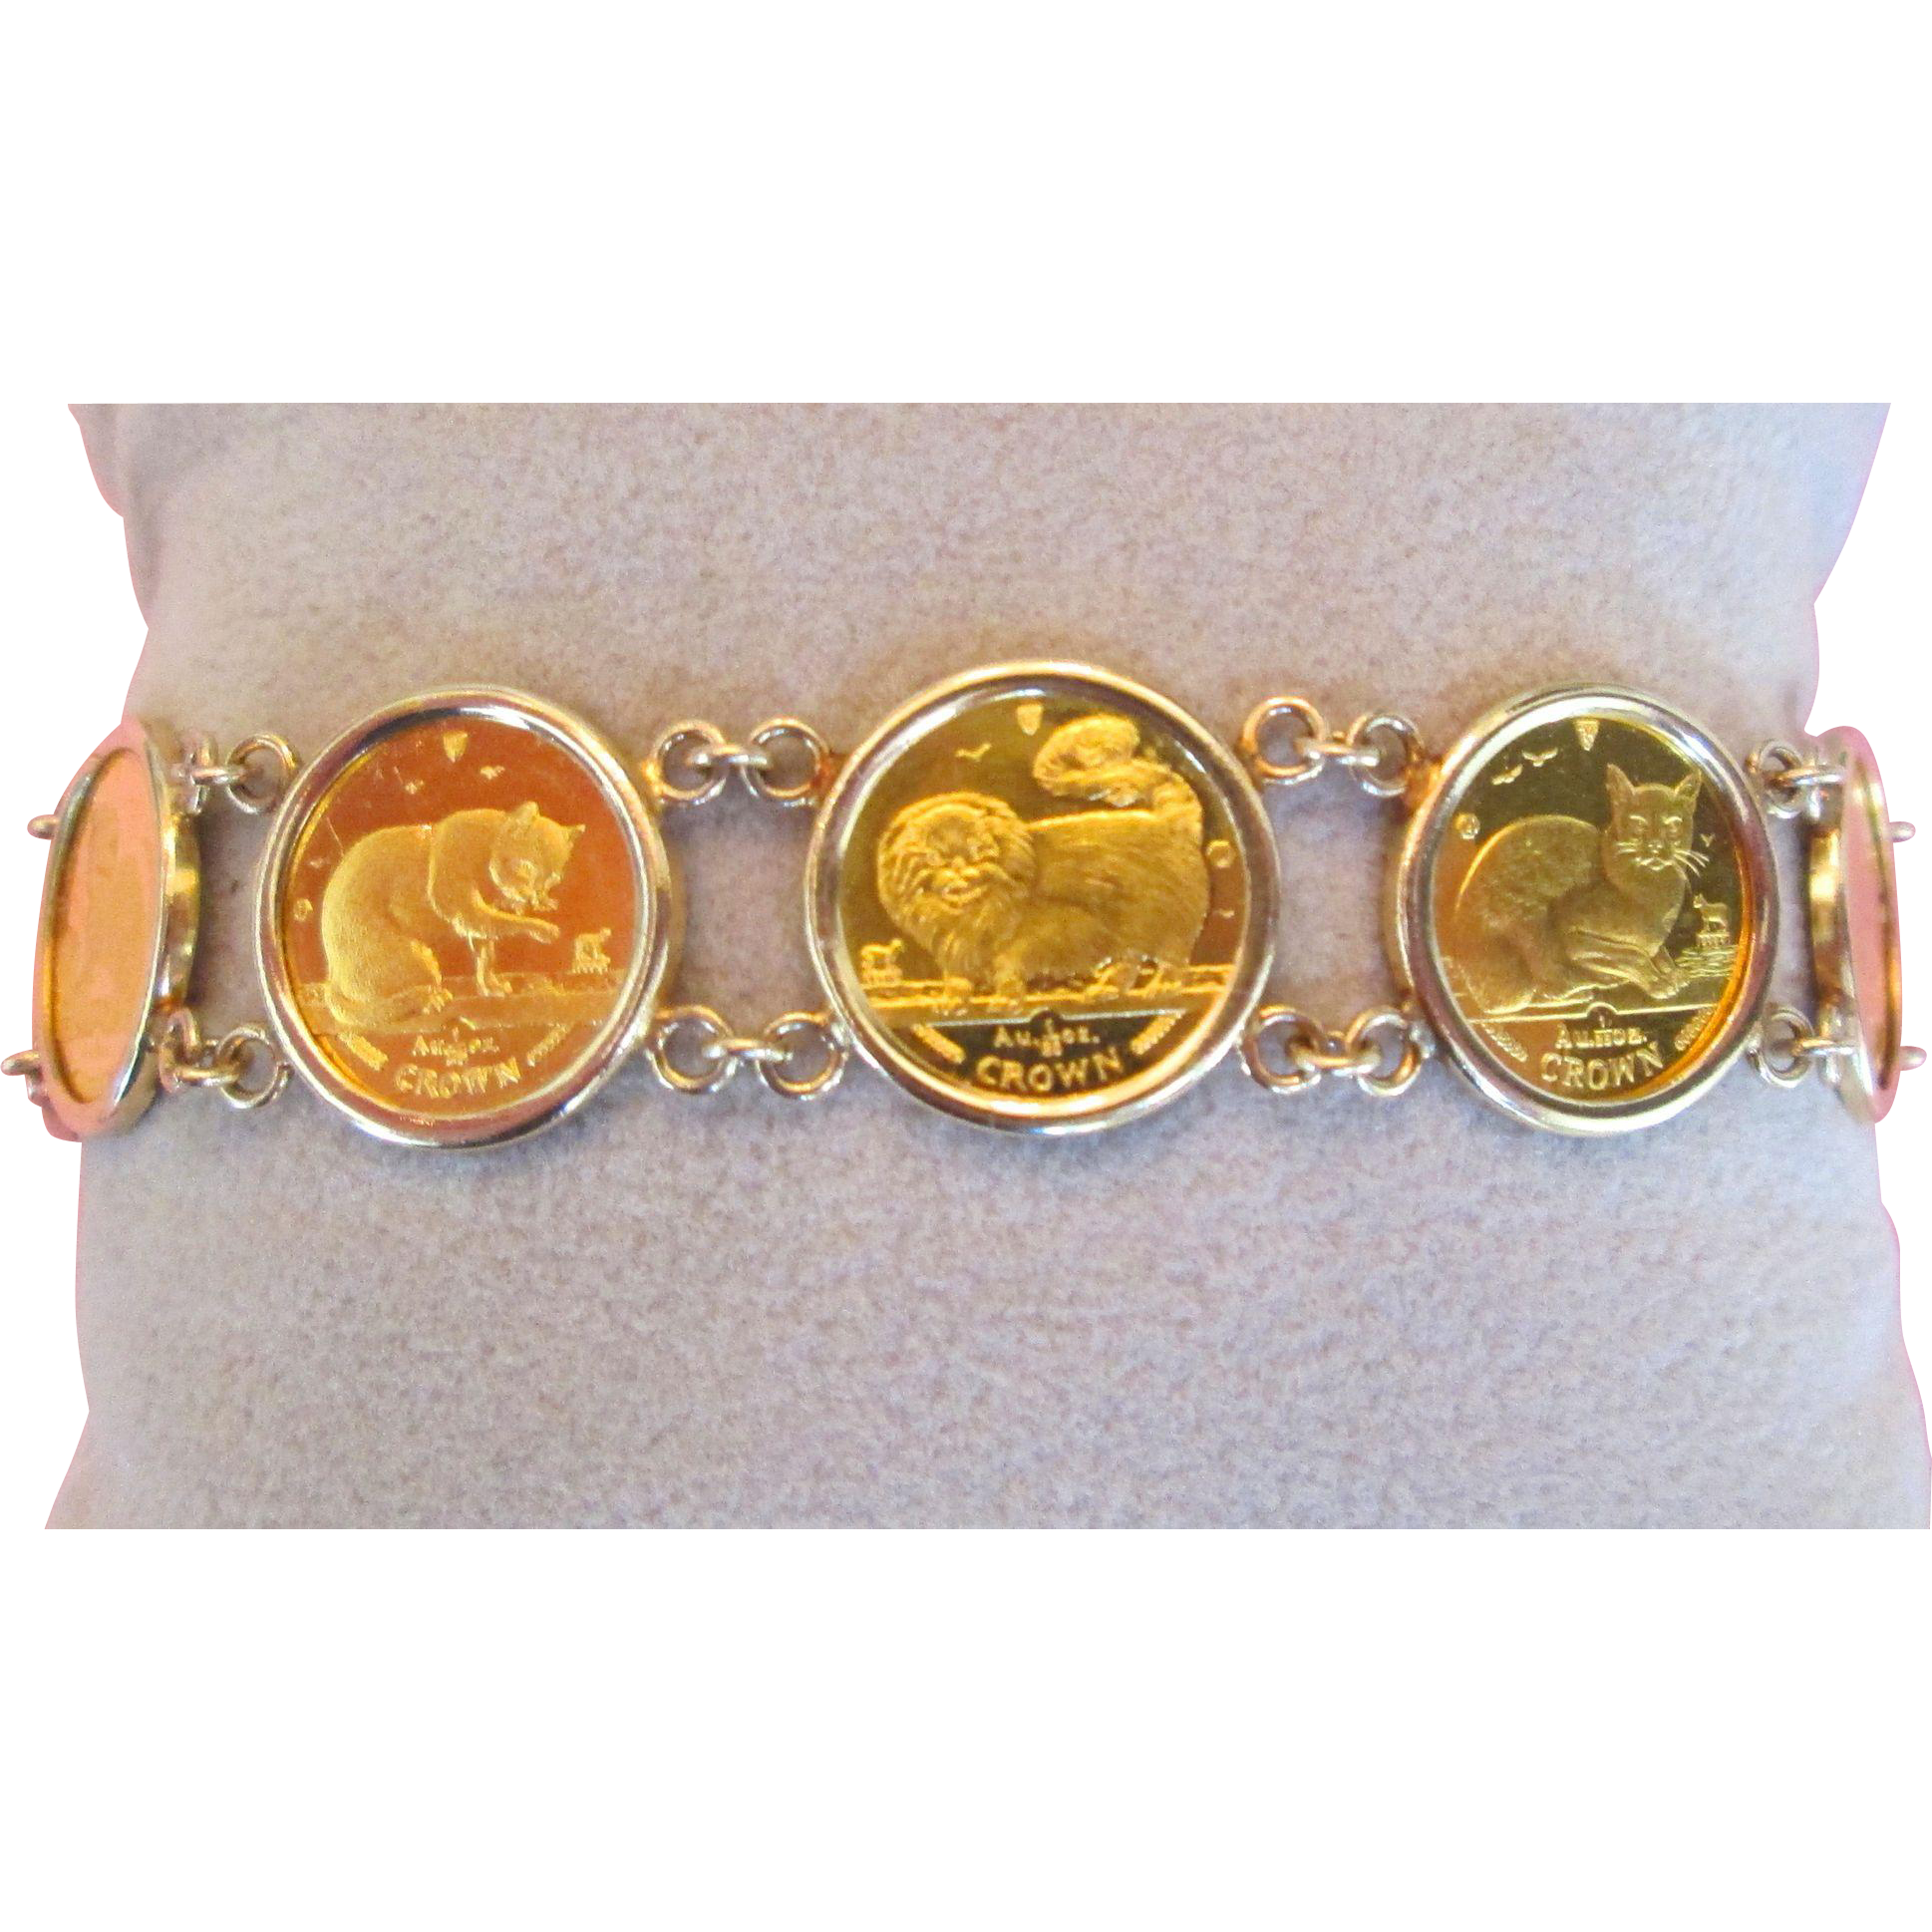 24k Gold Queen Elizabeth Isle Of Man Cat Coin Bracelet 14k Bezel 99 Bella Antiques And Jewels Ruby Lane